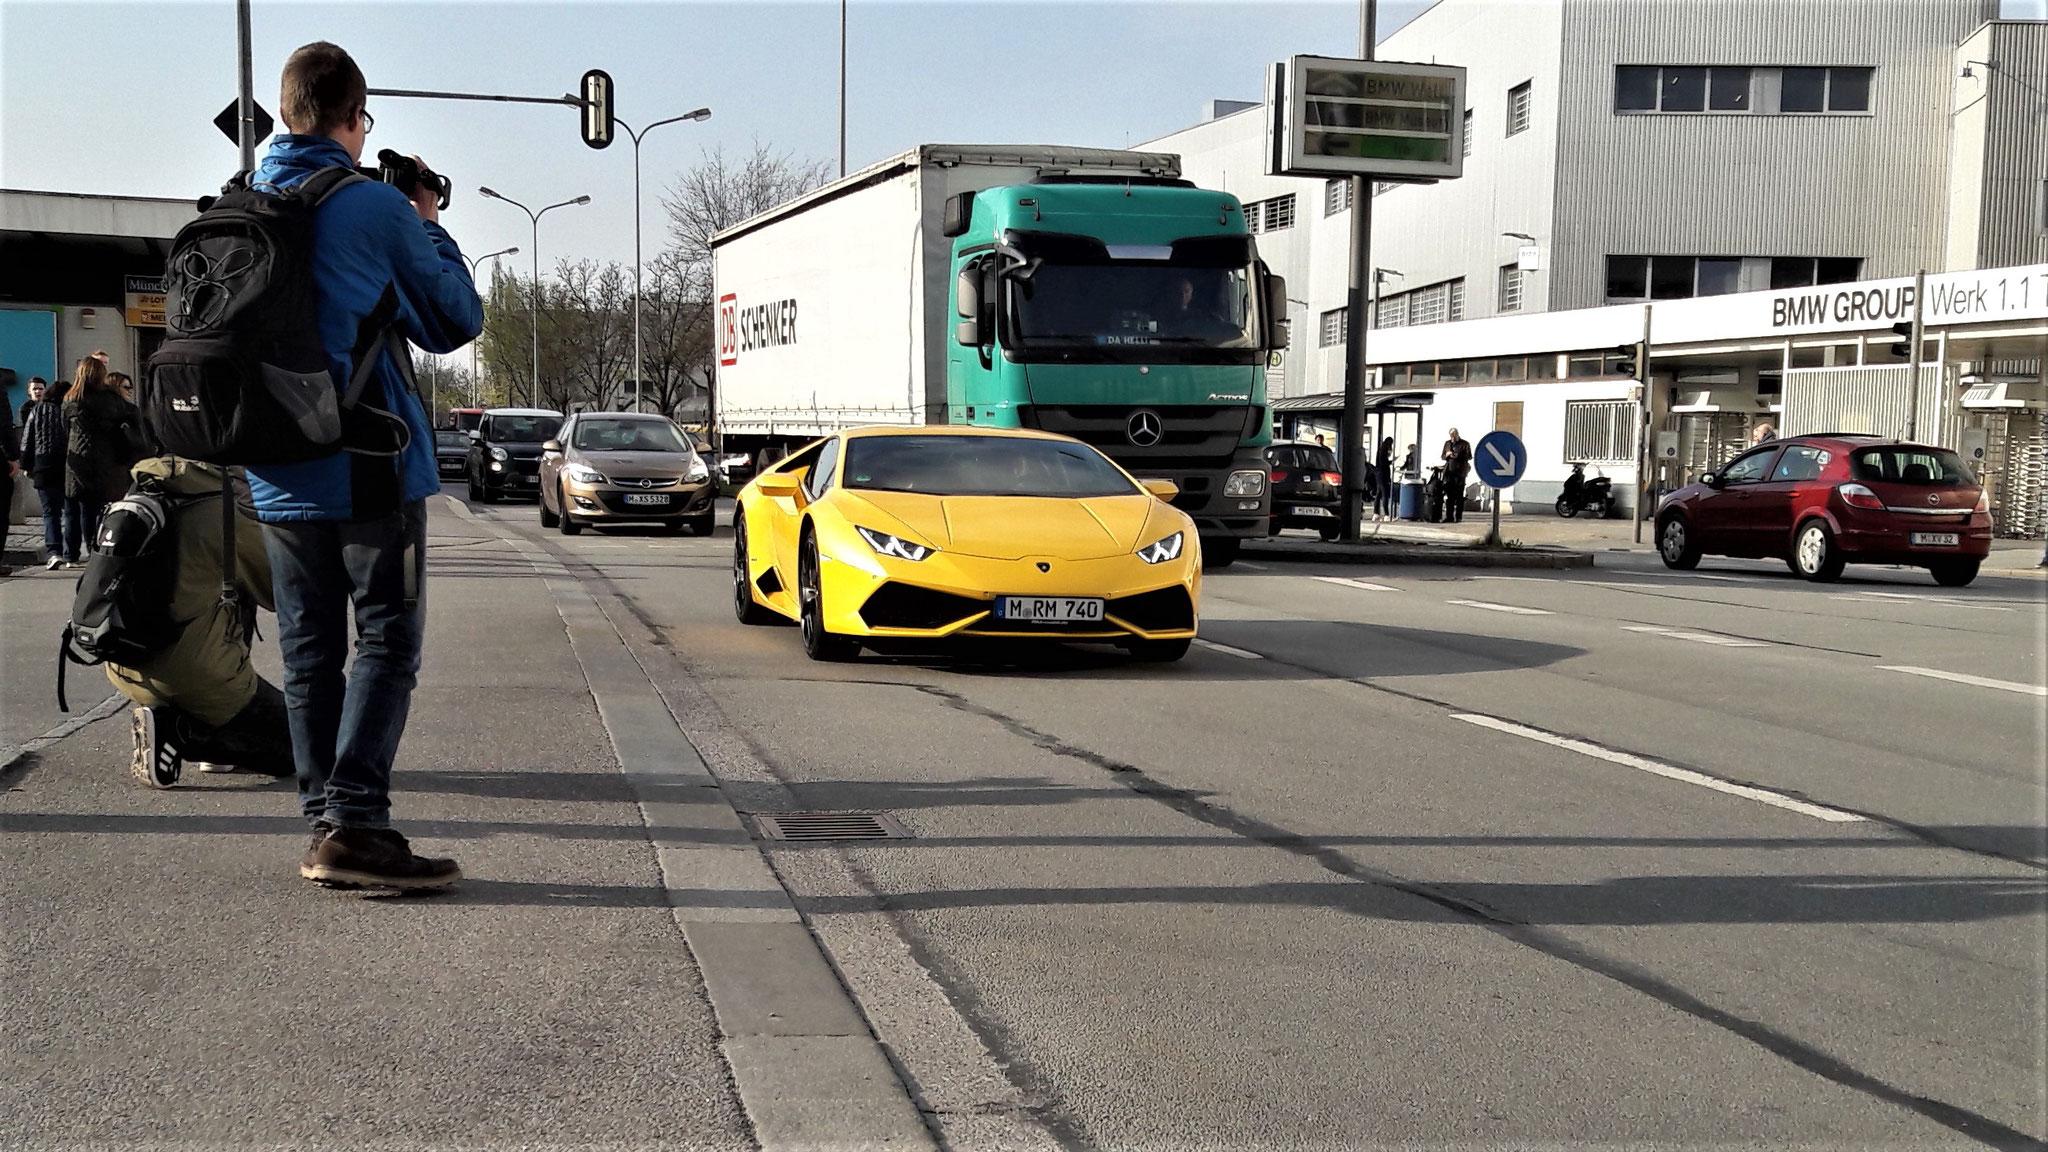 Lamborghini Huracan - M-LM-740